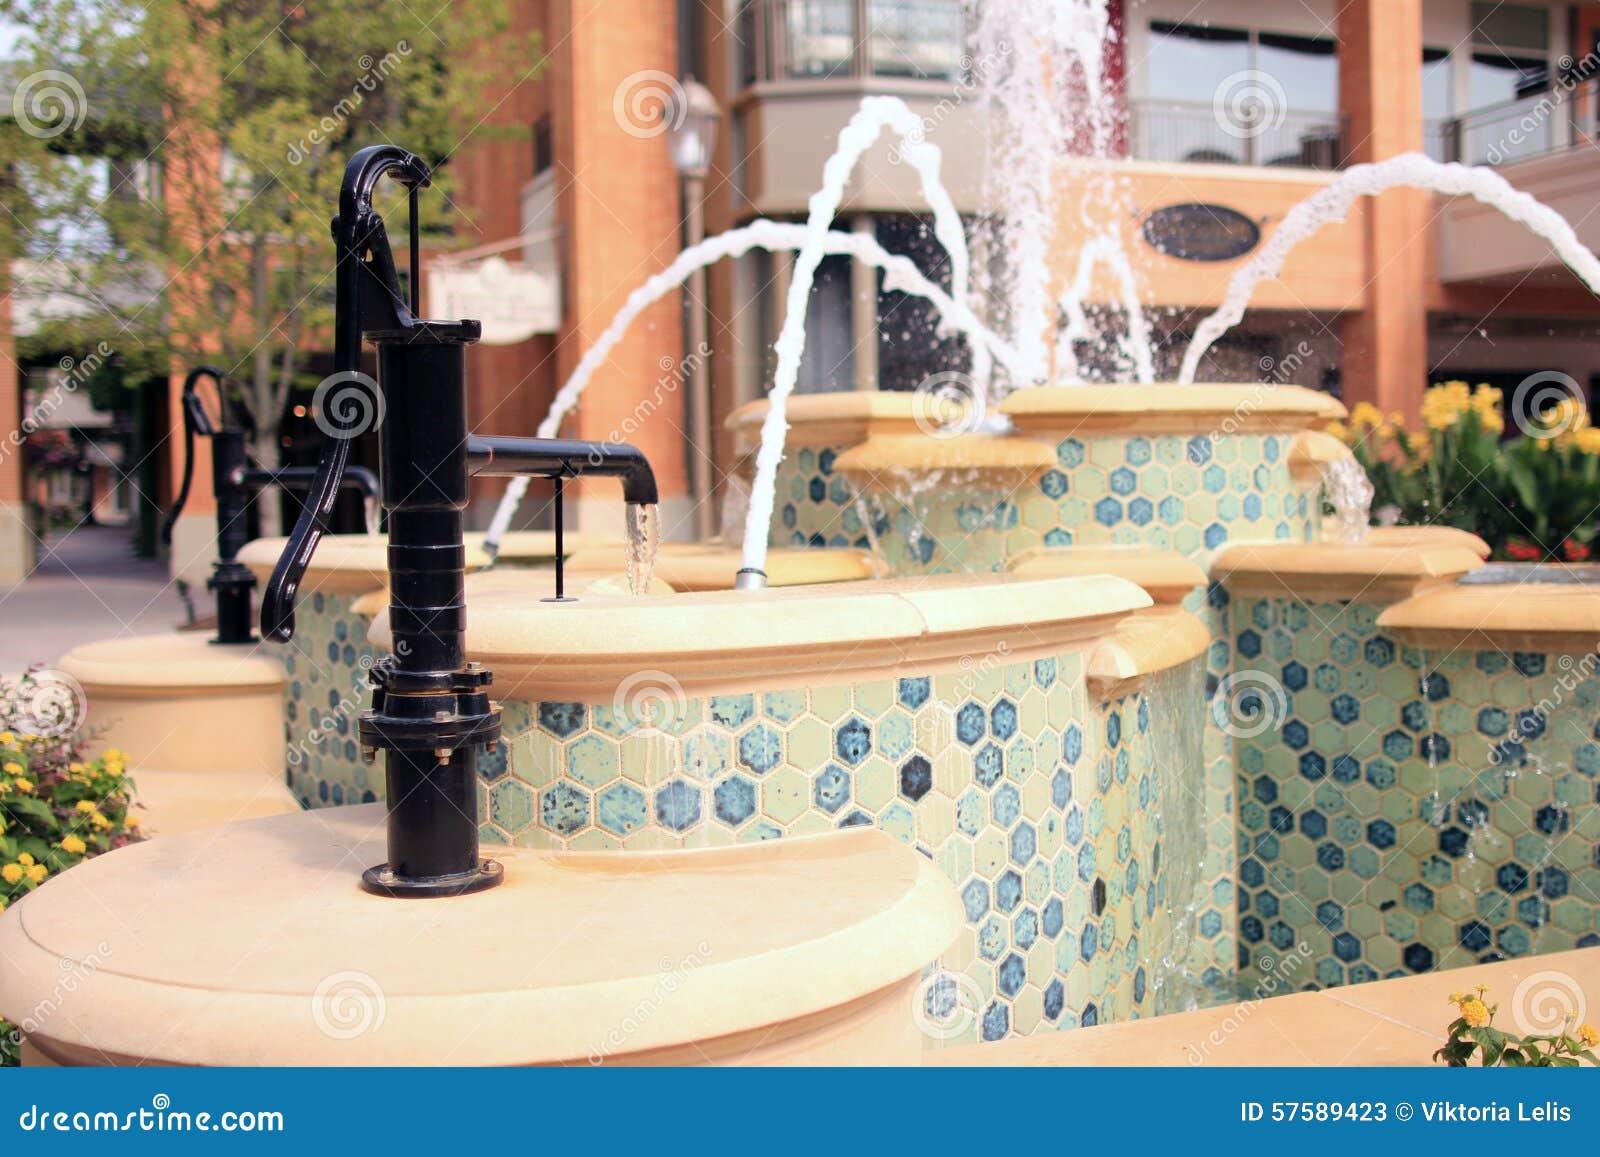 Water fountains virginia - Vintage Pump Water Fountain